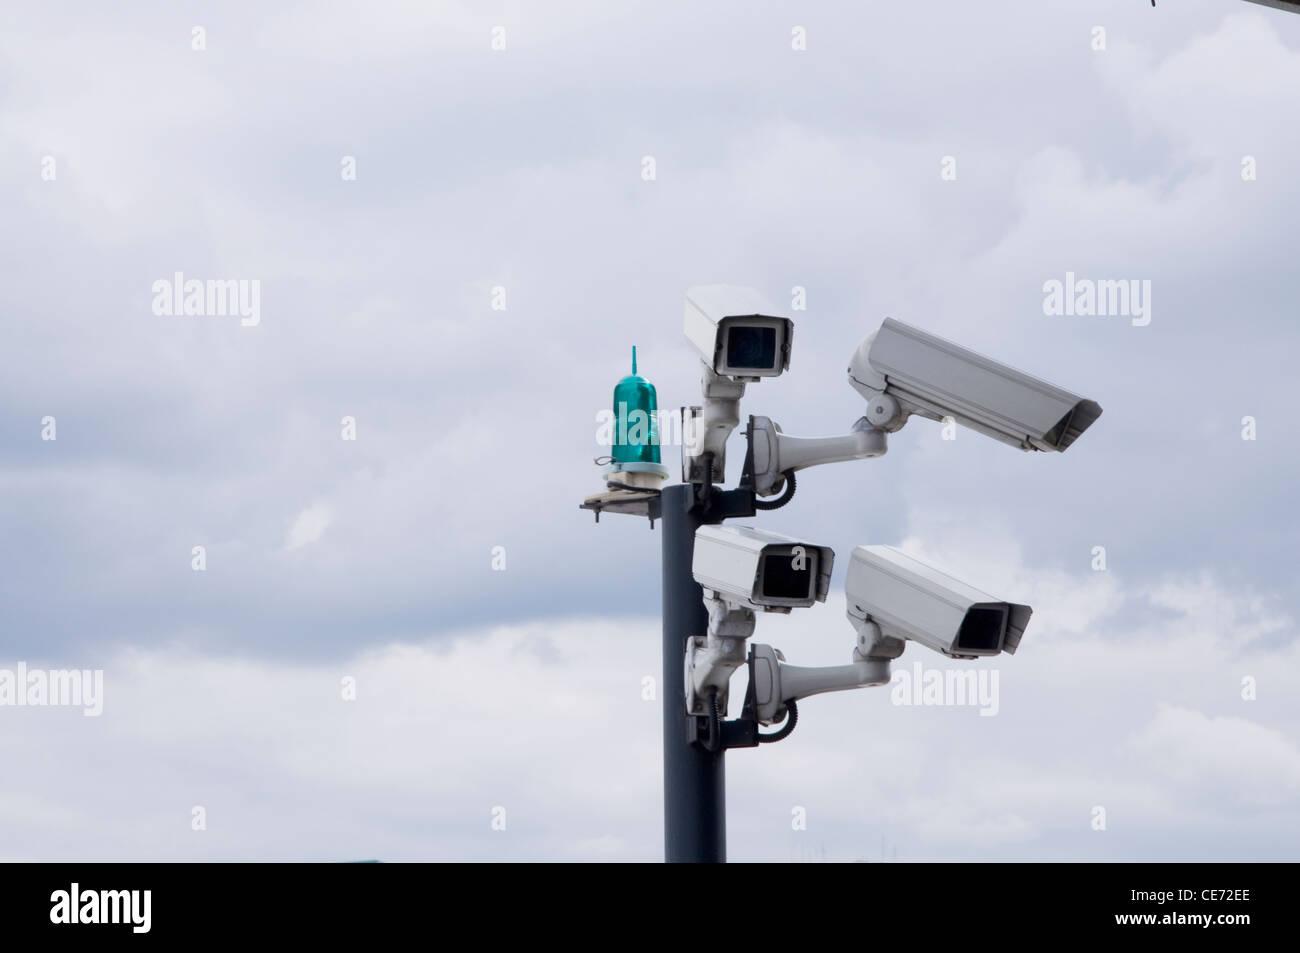 CCTV London big brother - Stock Image